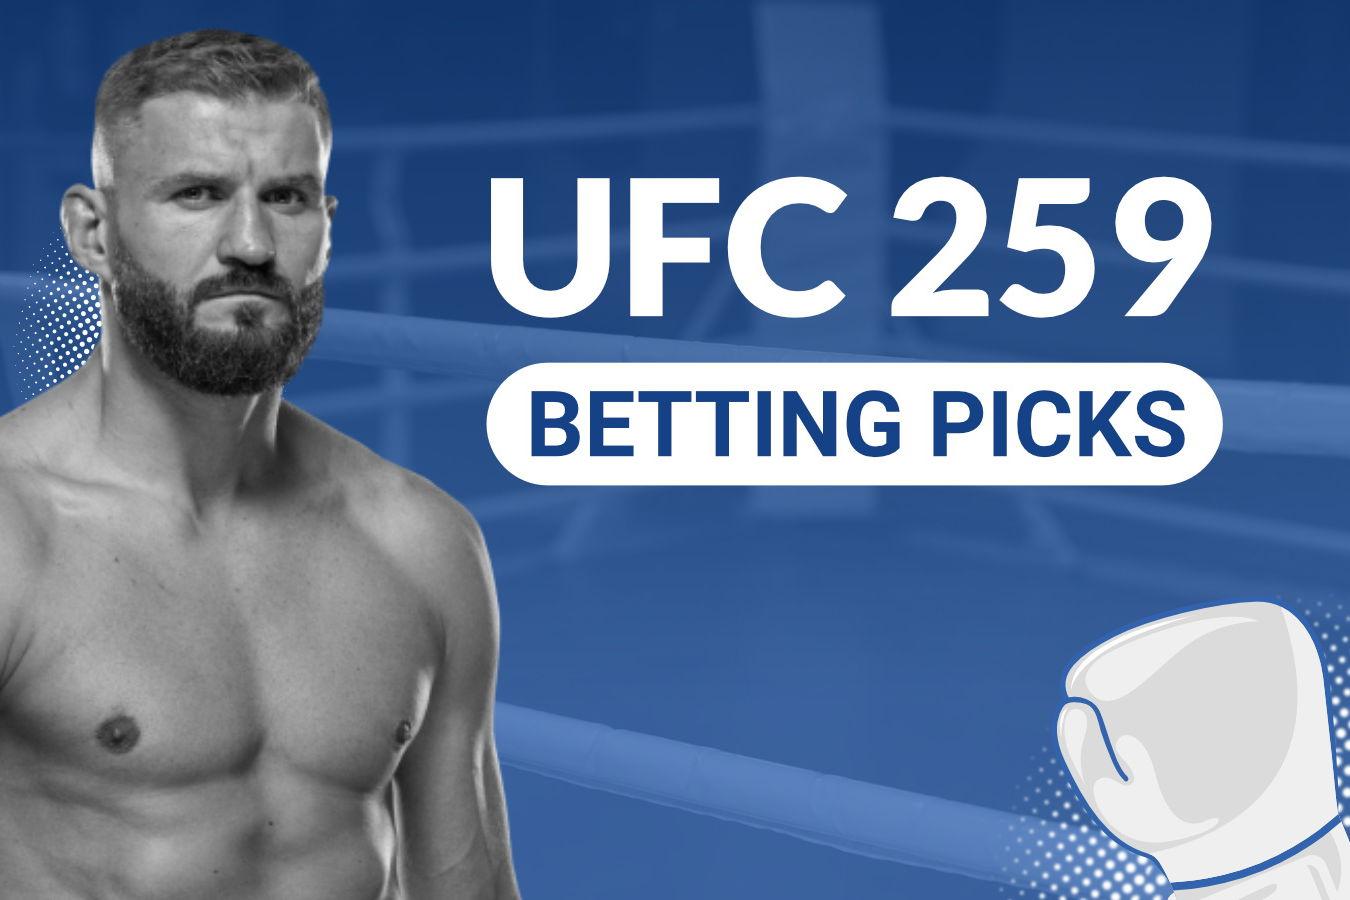 UFC 259 Picks: Adesanya To Successfully Step Up